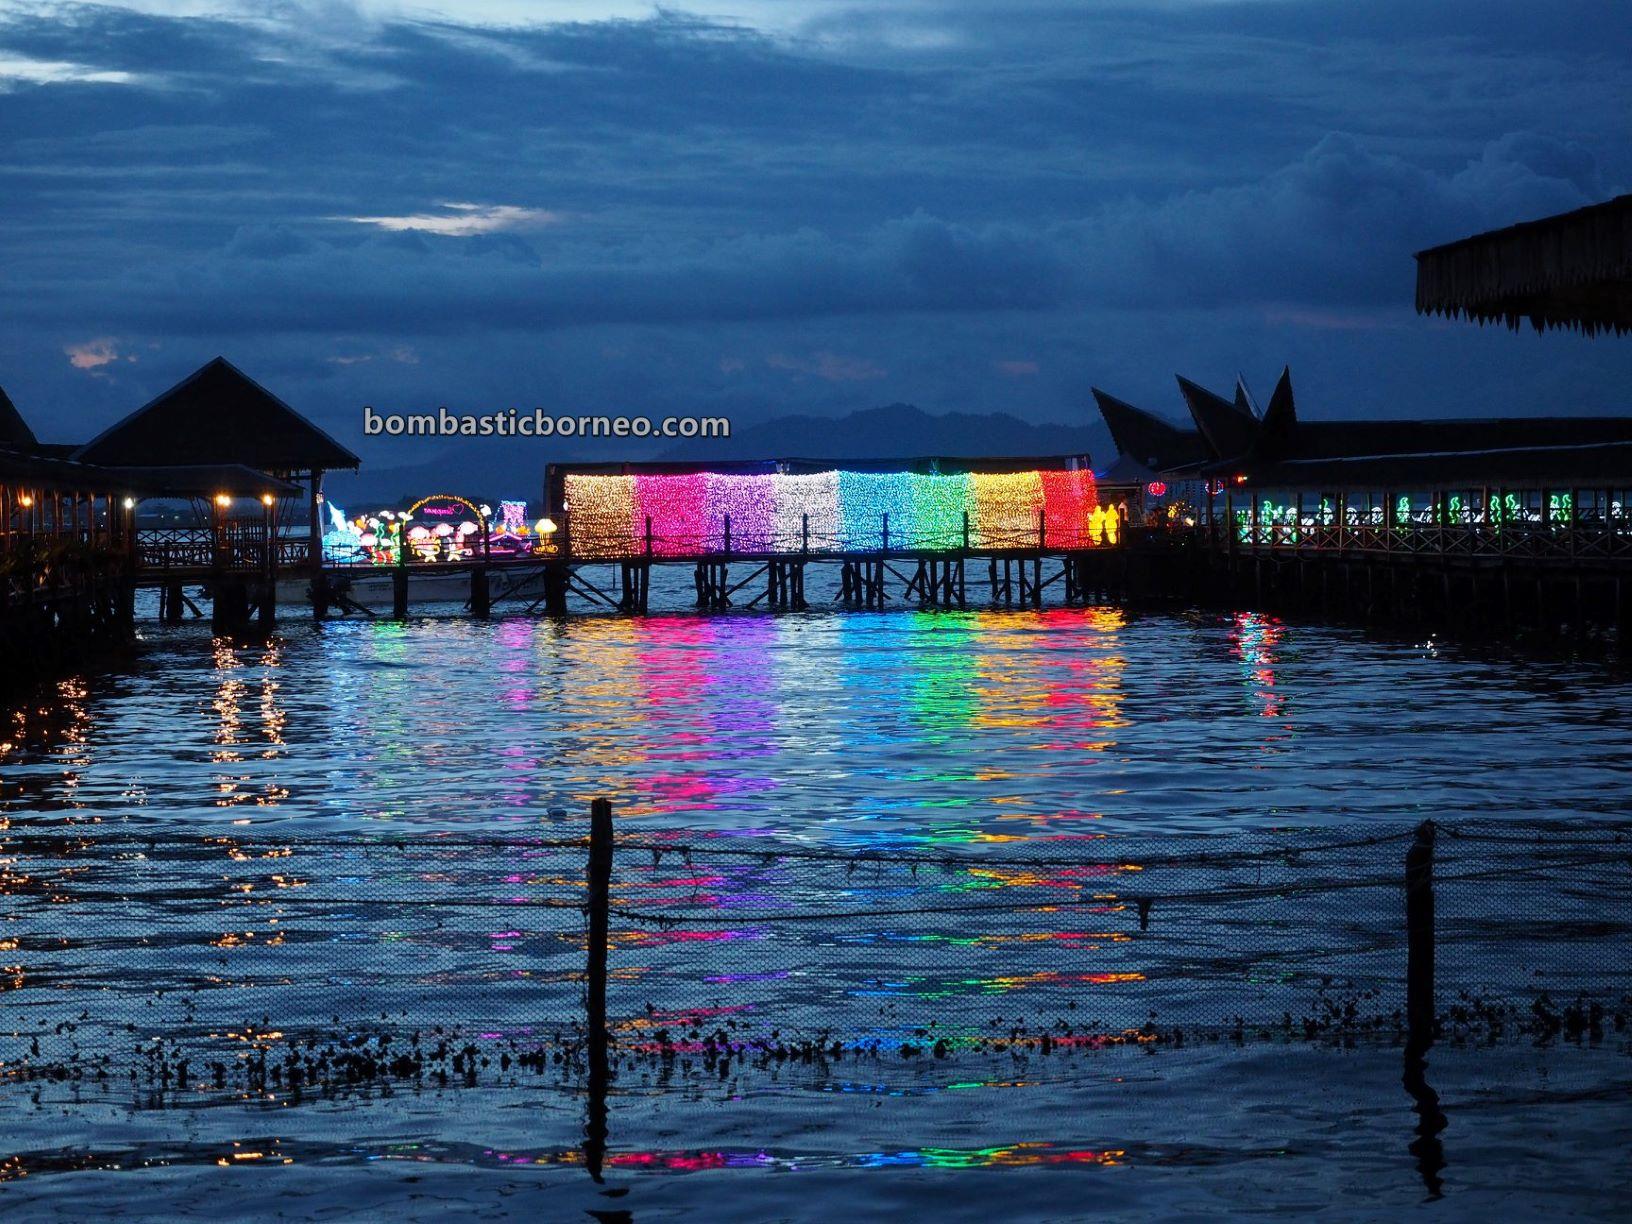 Pesta Regatta Lepa, Water Festival, backpackers, destination, island, Tawau, Tourist attraction, travel guide, Cross Border, 穿越婆罗洲游踪, 马来西亚仙本那, 沙巴旅游景点,